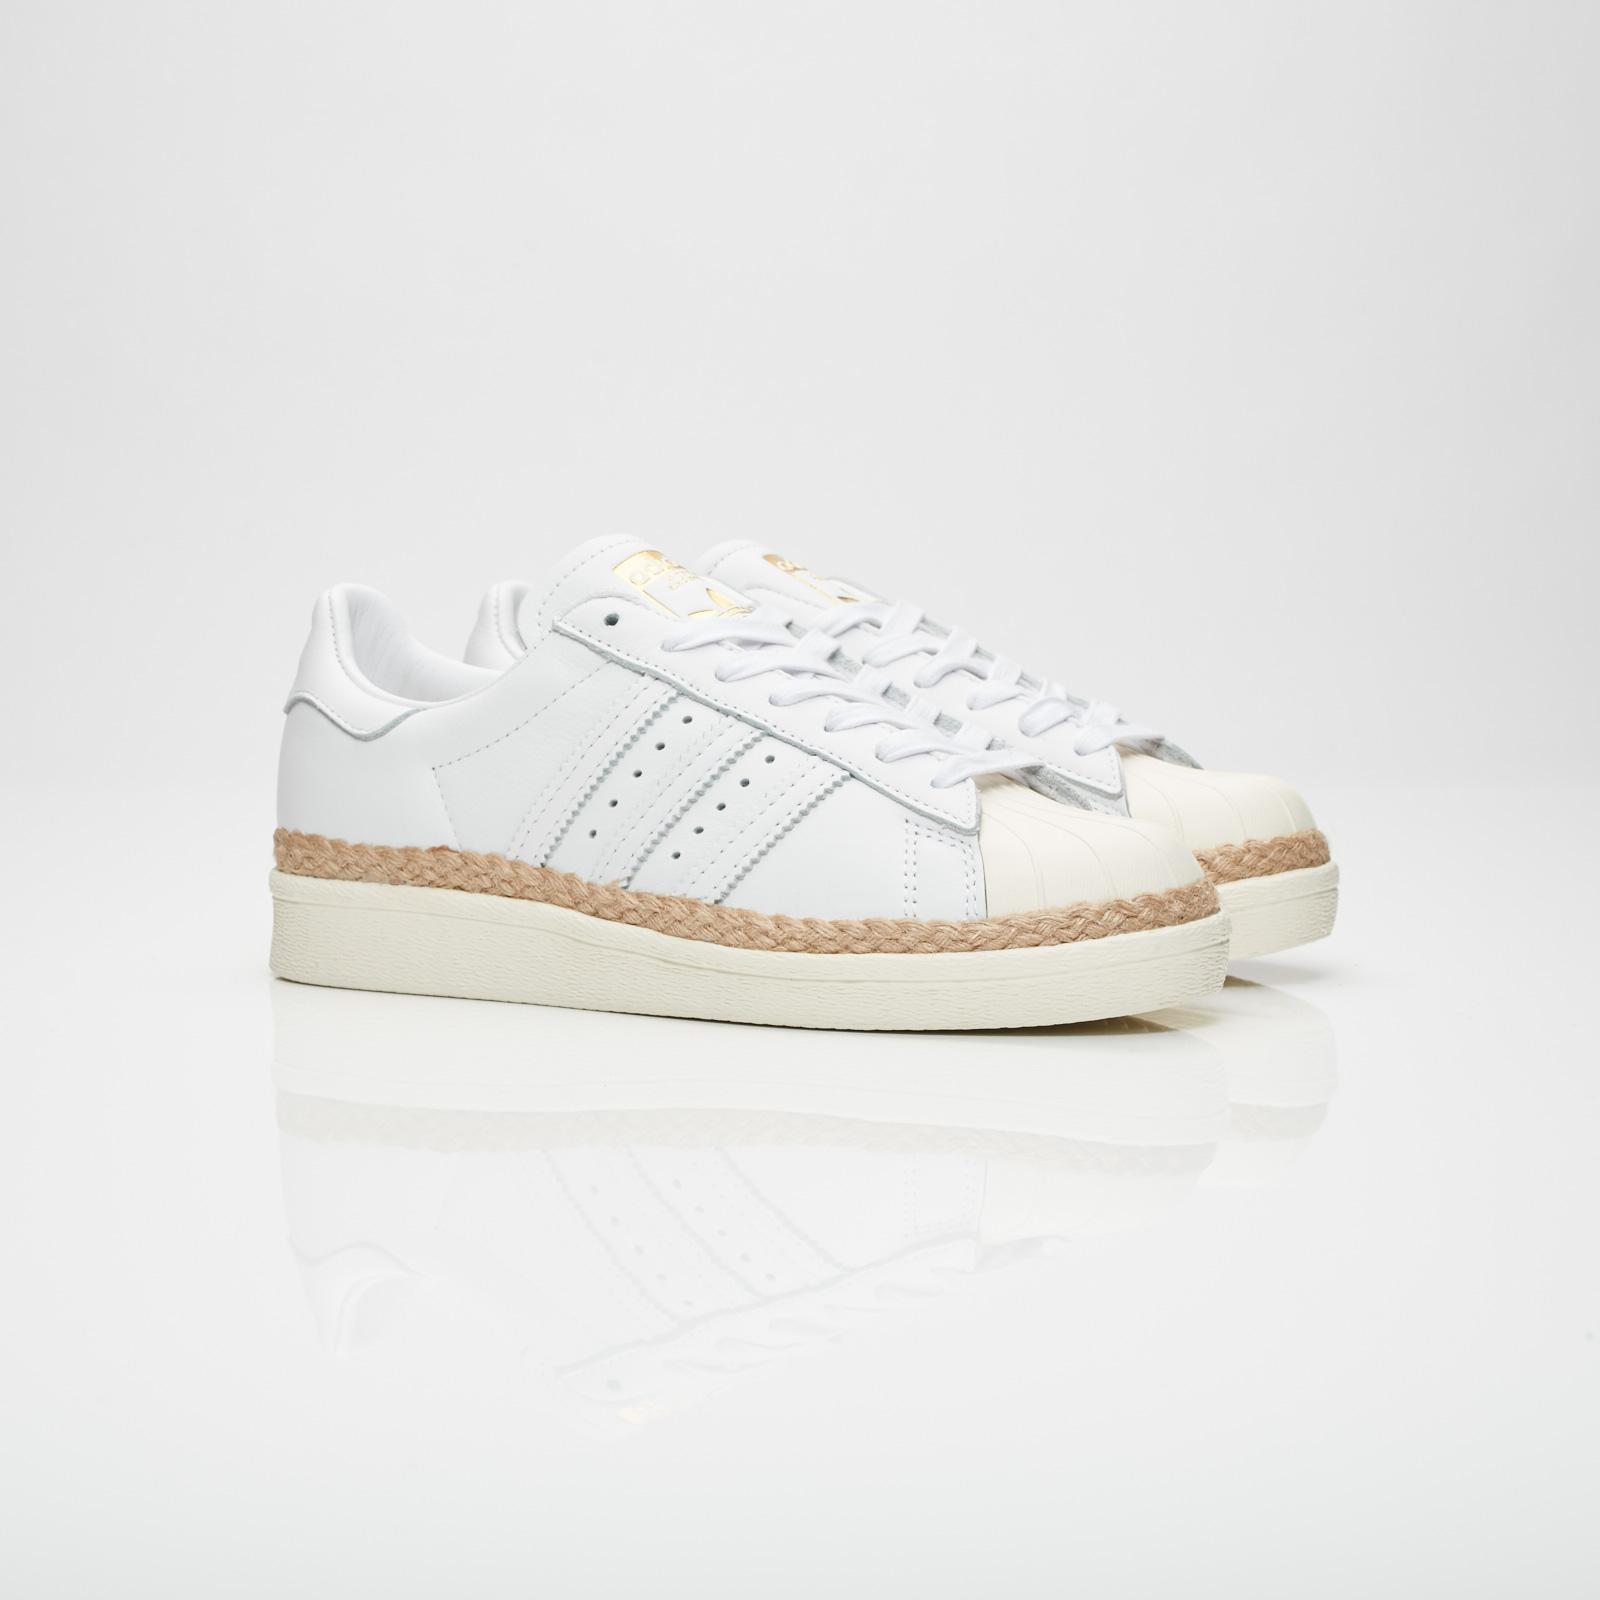 adidas Superstar 80s New Bold Womens - Da9573 - SNS | sneakers ...